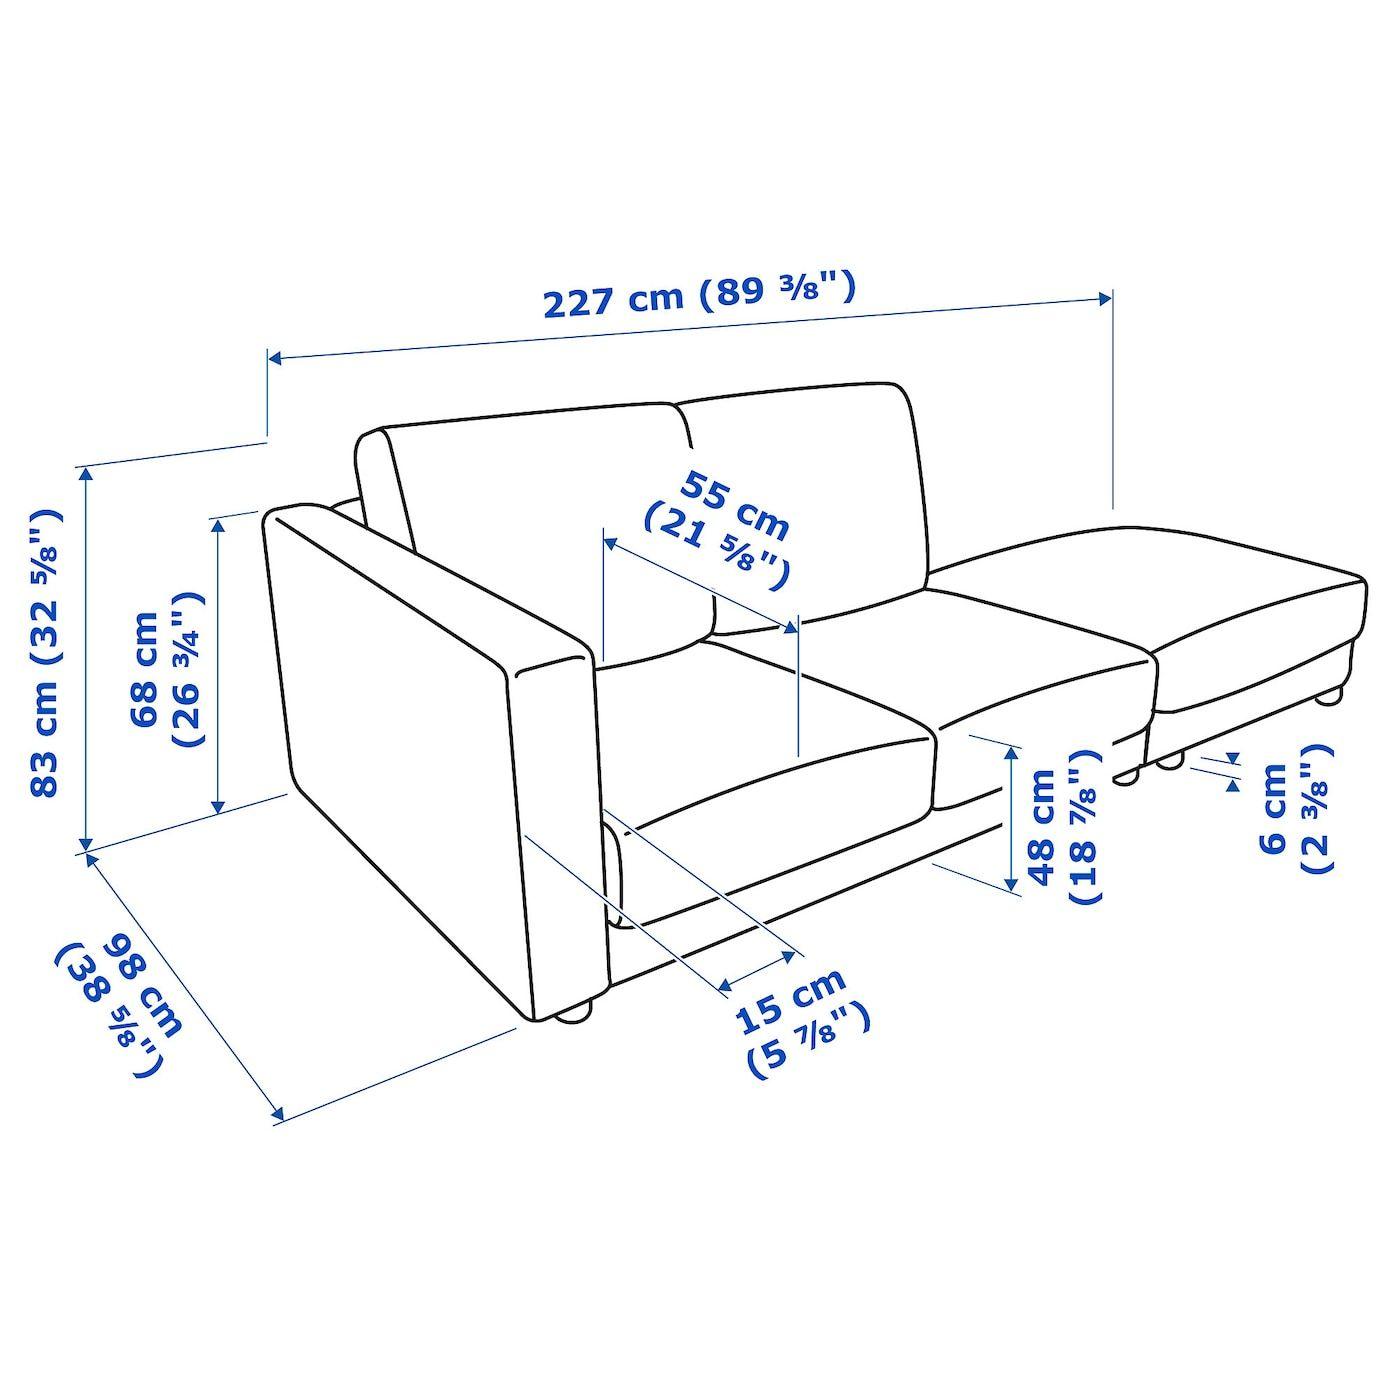 Ikea Vimle 3er Sofa Ohne Abschluss Tallmyra Beige In 2020 3er Sofa Sofa Kaltschaum